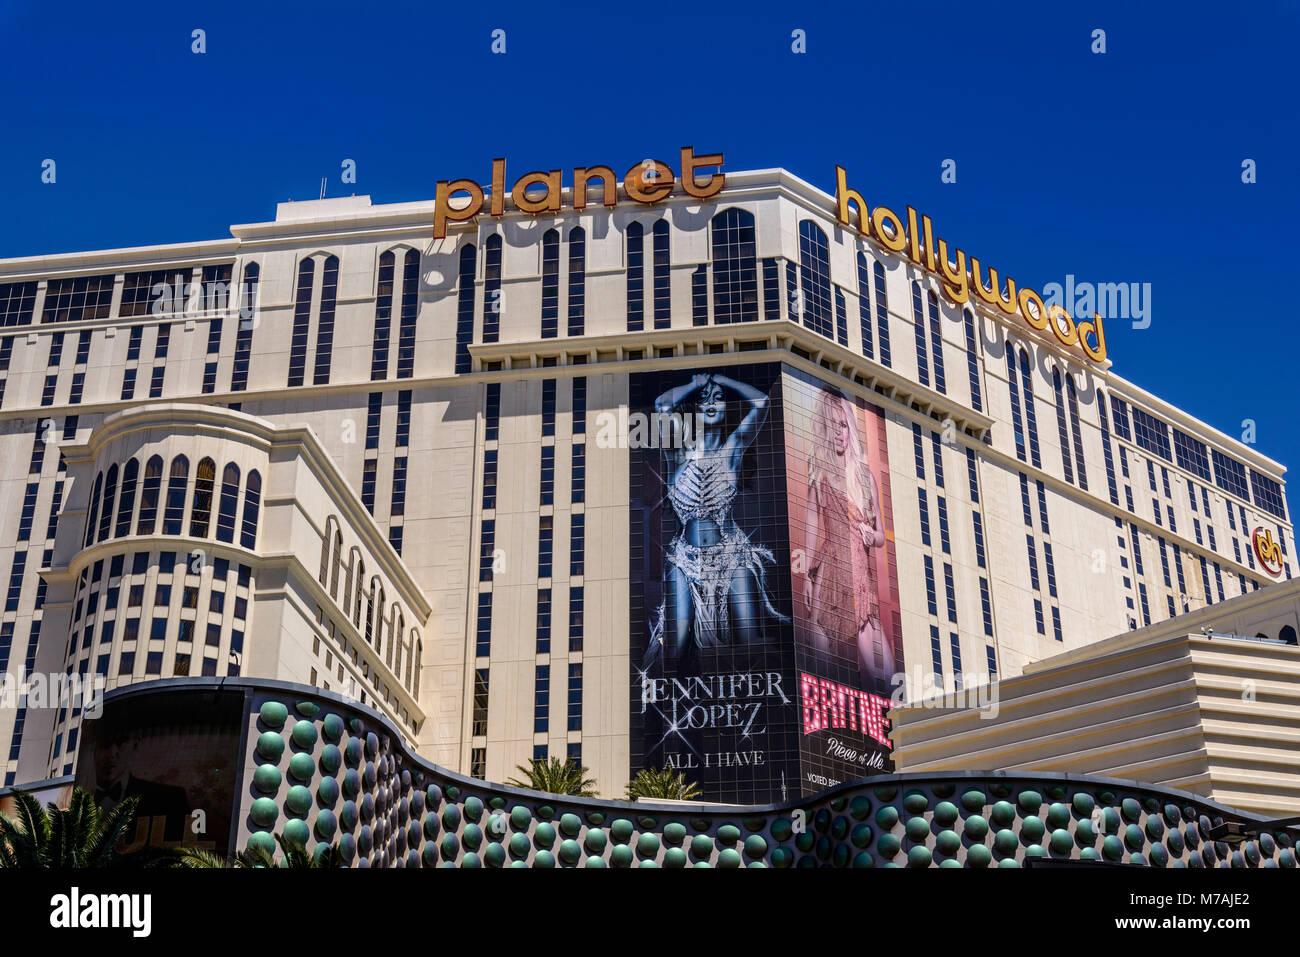 The USA, Nevada, Clark County, Las Vegas, Las Vegas Boulevard, The Strip, planet Hollywood - Stock Image